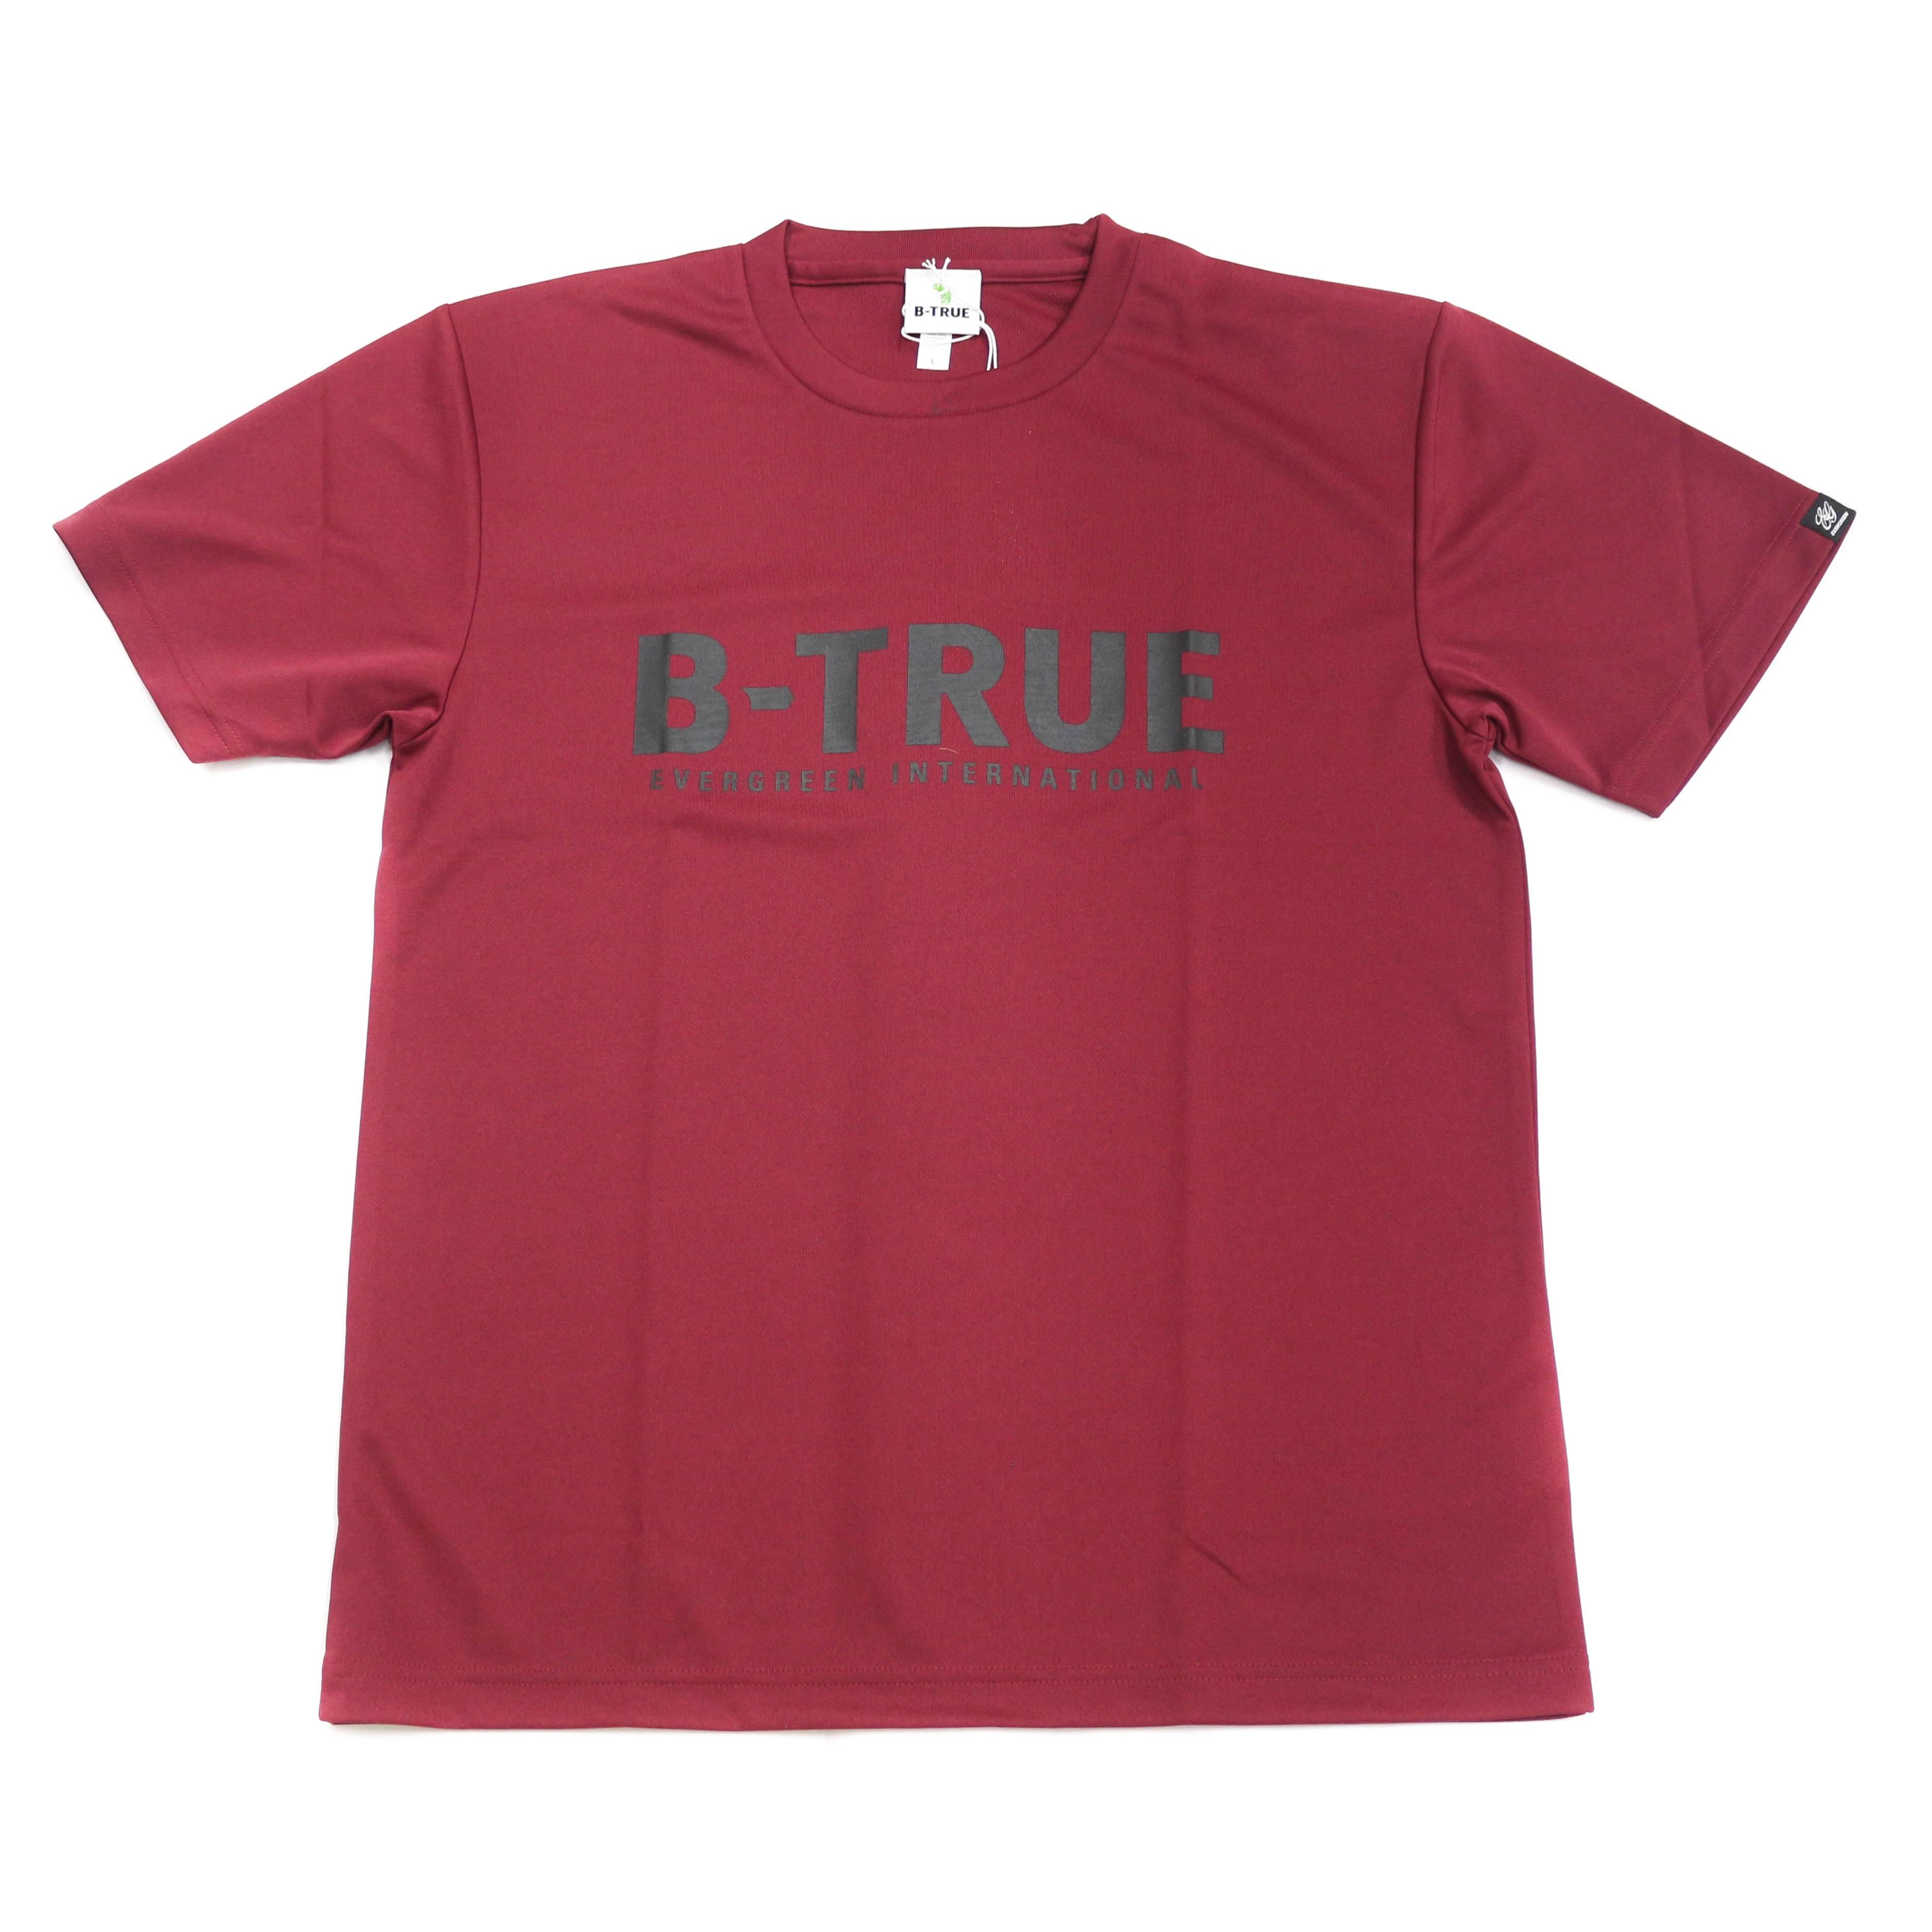 Evergreen T-Shirt Dry Fit Short Sleeve B-True A Type Size L Burgundy (6604)